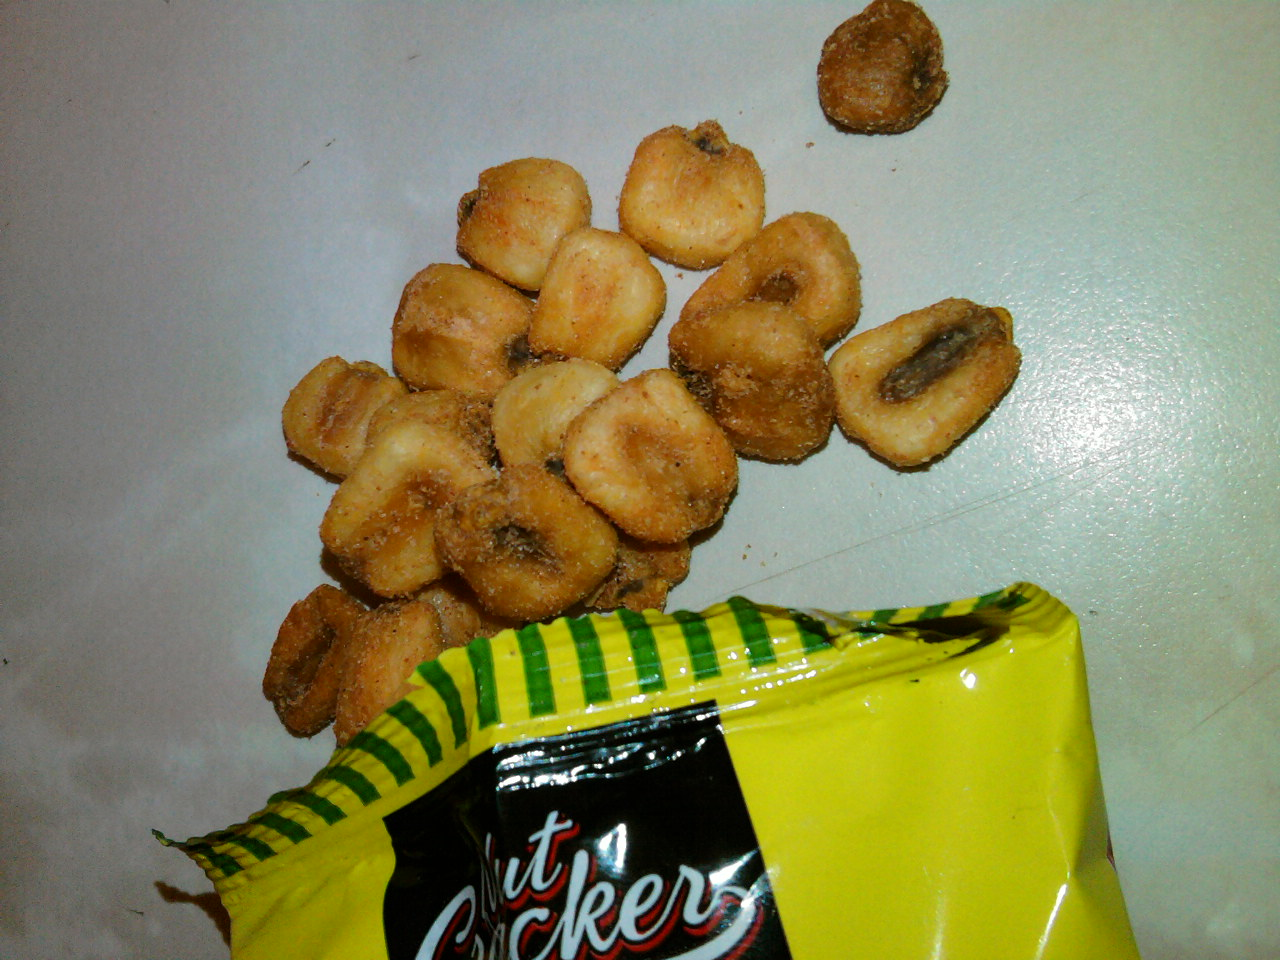 Nut Cracker Crunchy Roasted Corn Chilli & Lemon Flavour Corn Snack open bag closeup